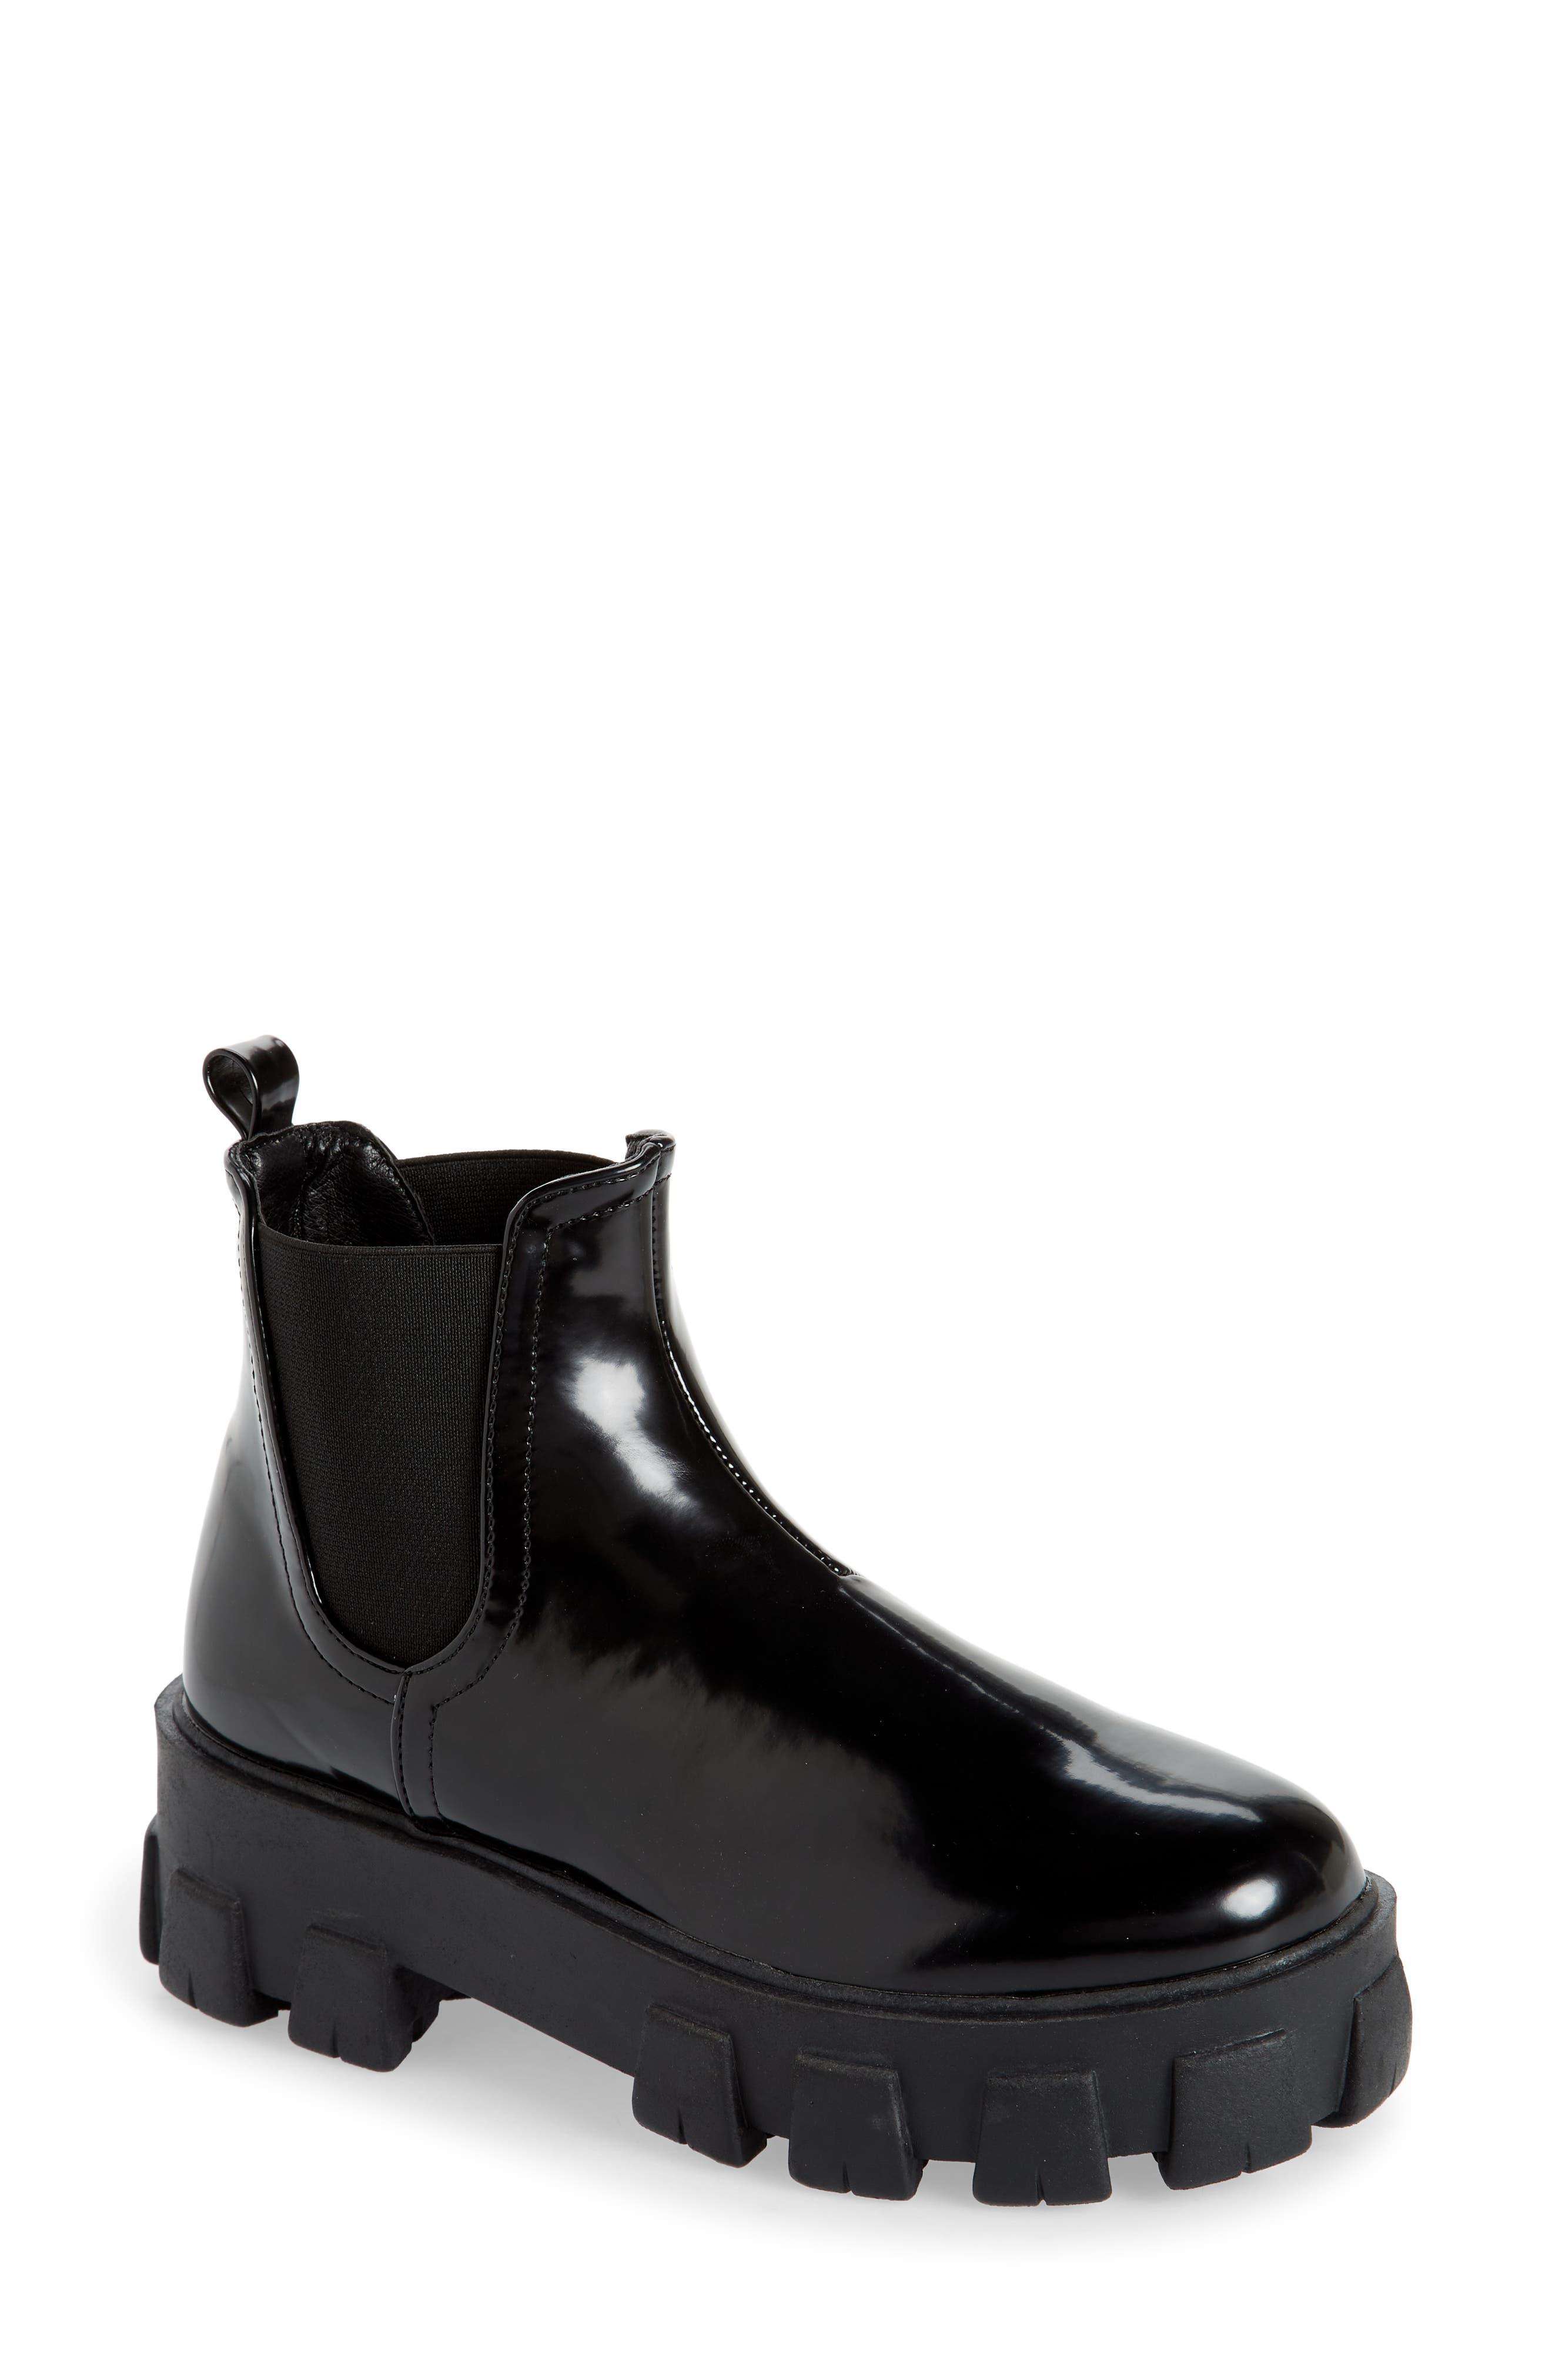 Xanthos Lug Chelsea Boot